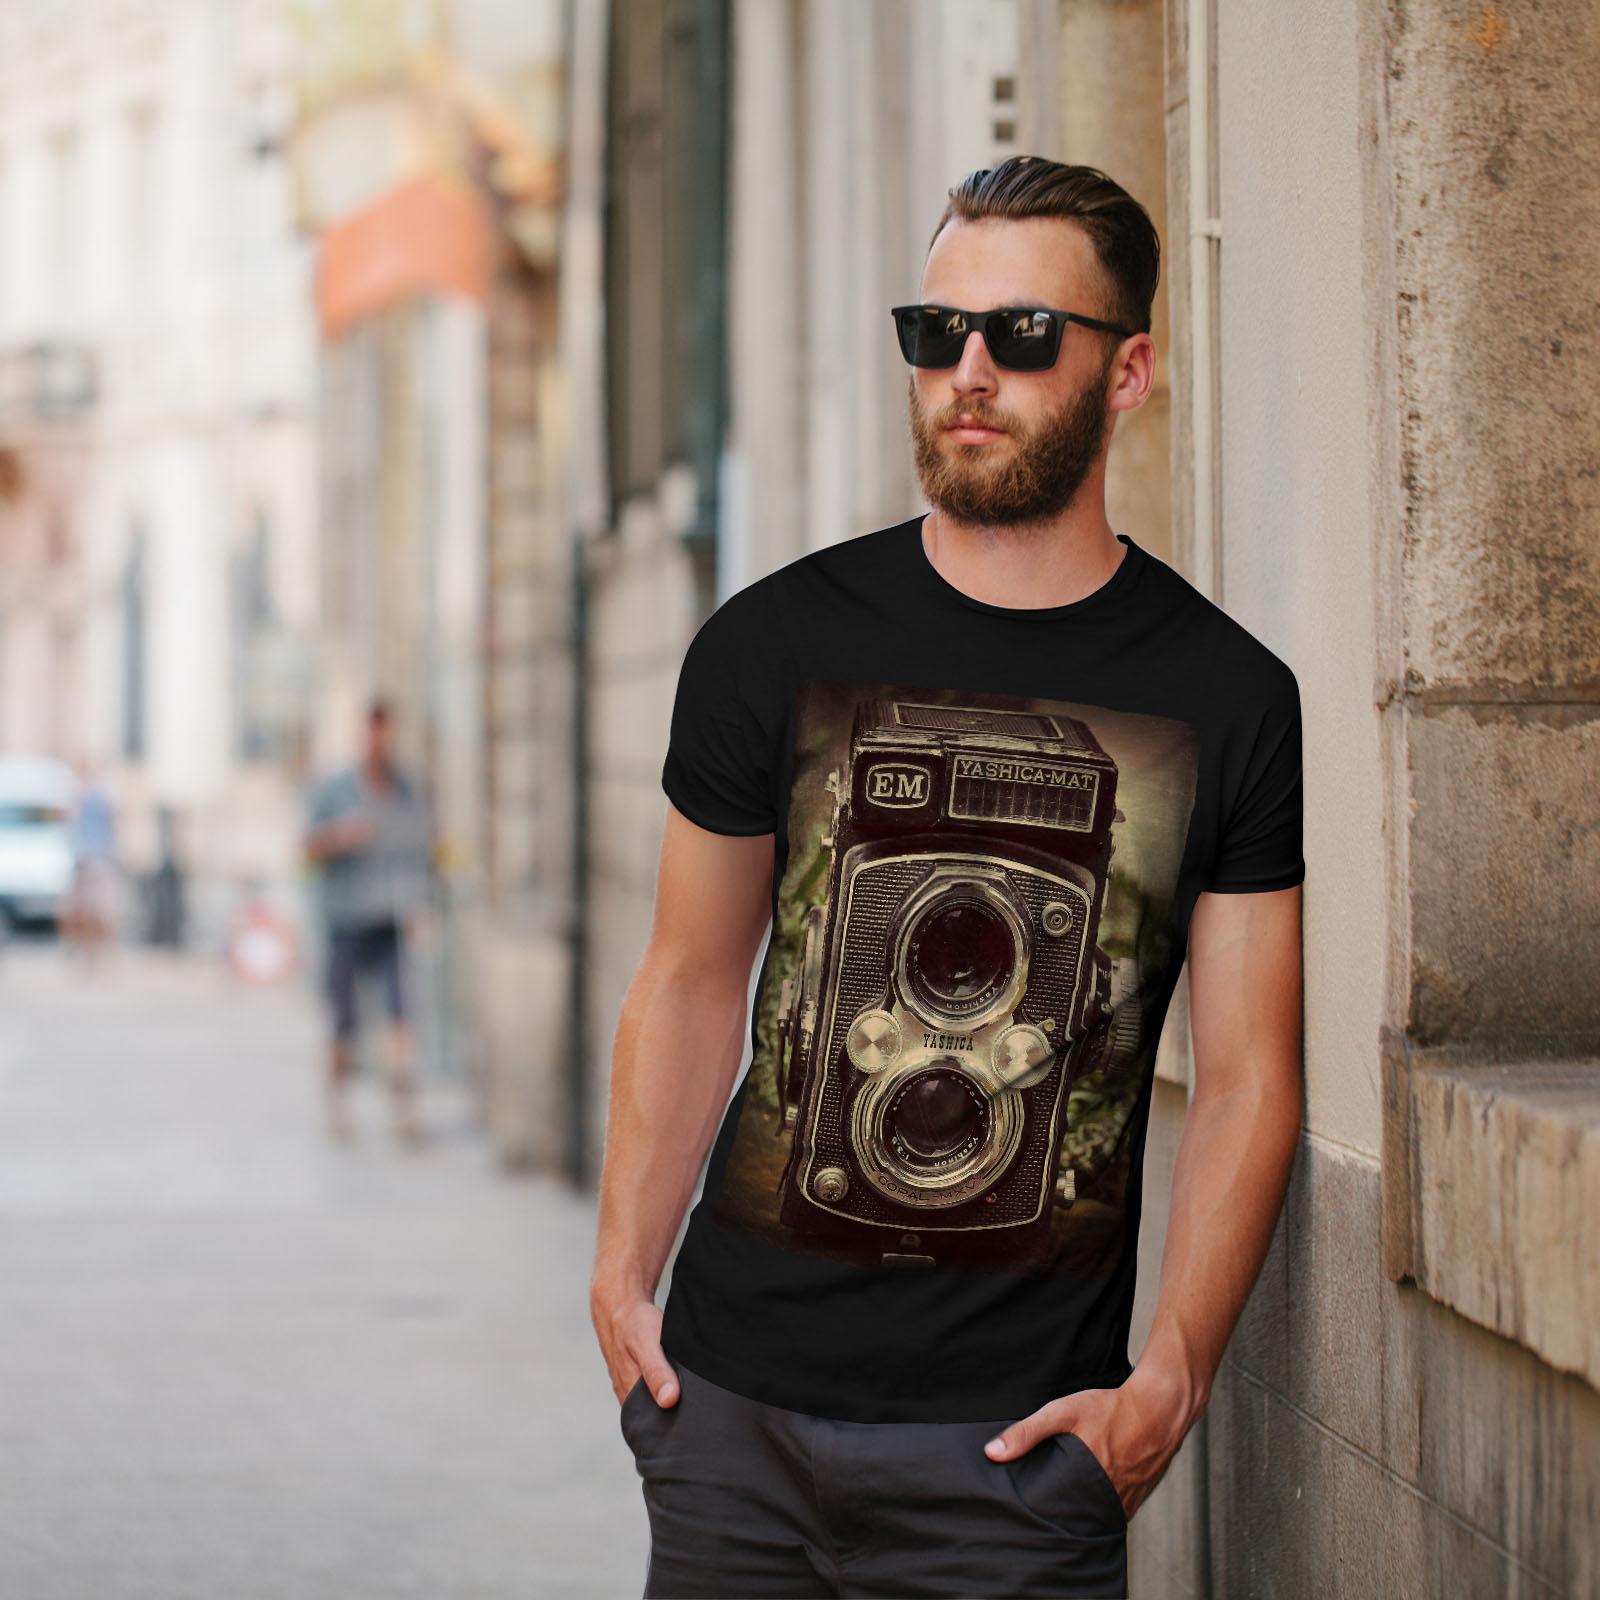 Wellcoda-Old-Foto-Camera-Mens-T-shirt-Retro-Graphic-Design-Printed-Tee thumbnail 5